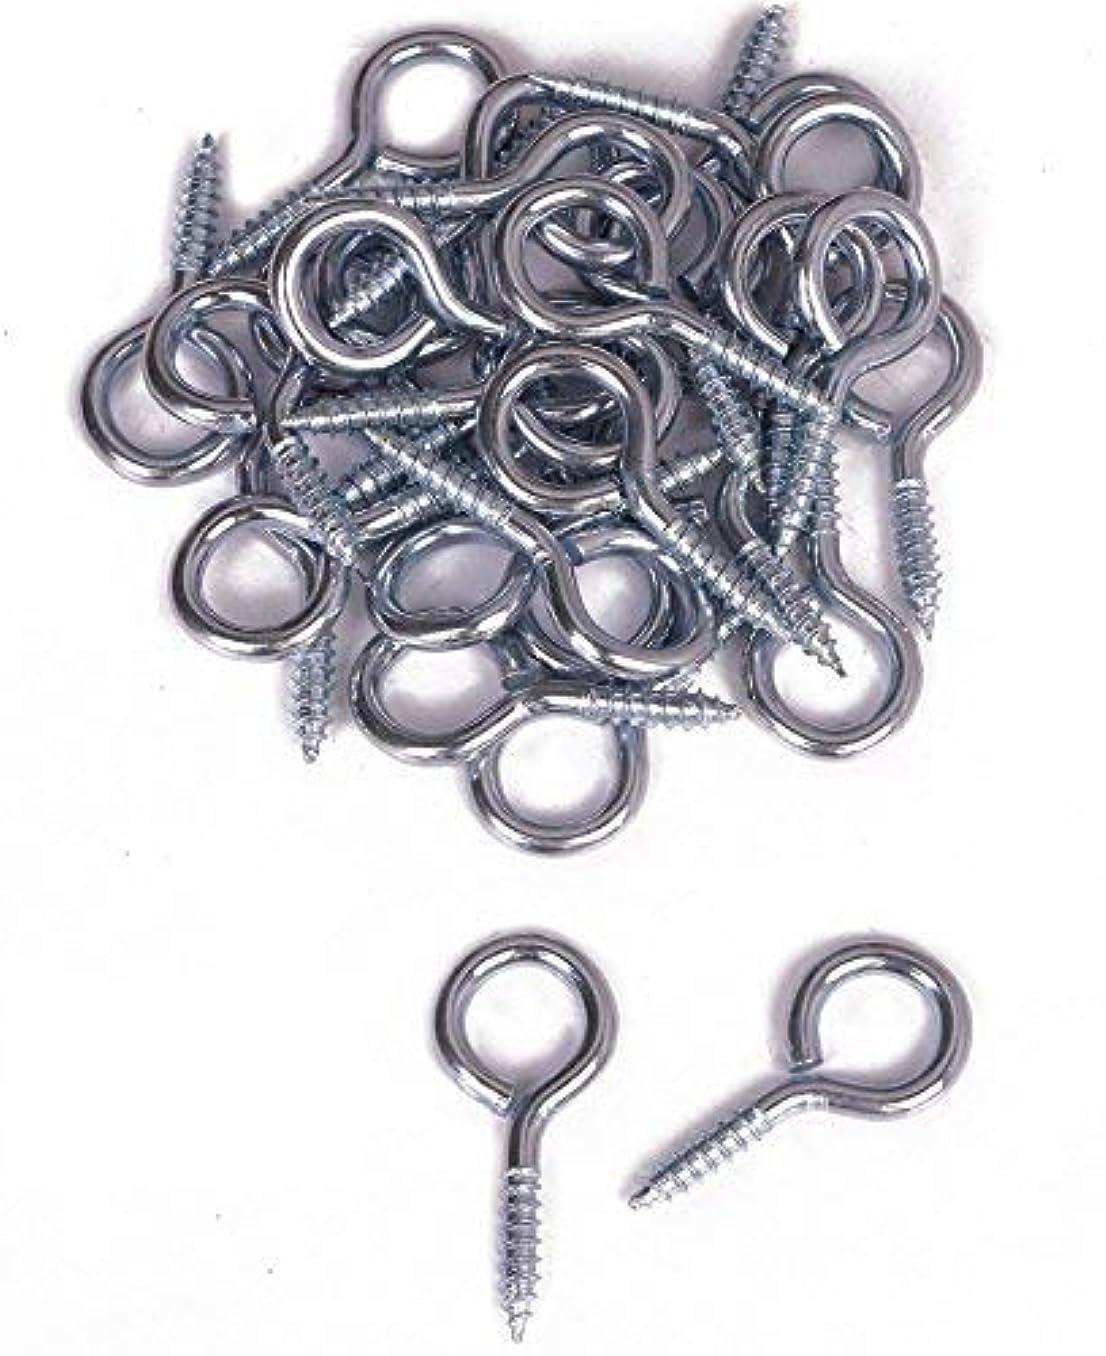 Shapenty 30PCS Metal Threaded Screw Eyes Pins Lag Eyebolt Hanging Cup Hooks Ring (Silver, 45mm/1.8 Inch)